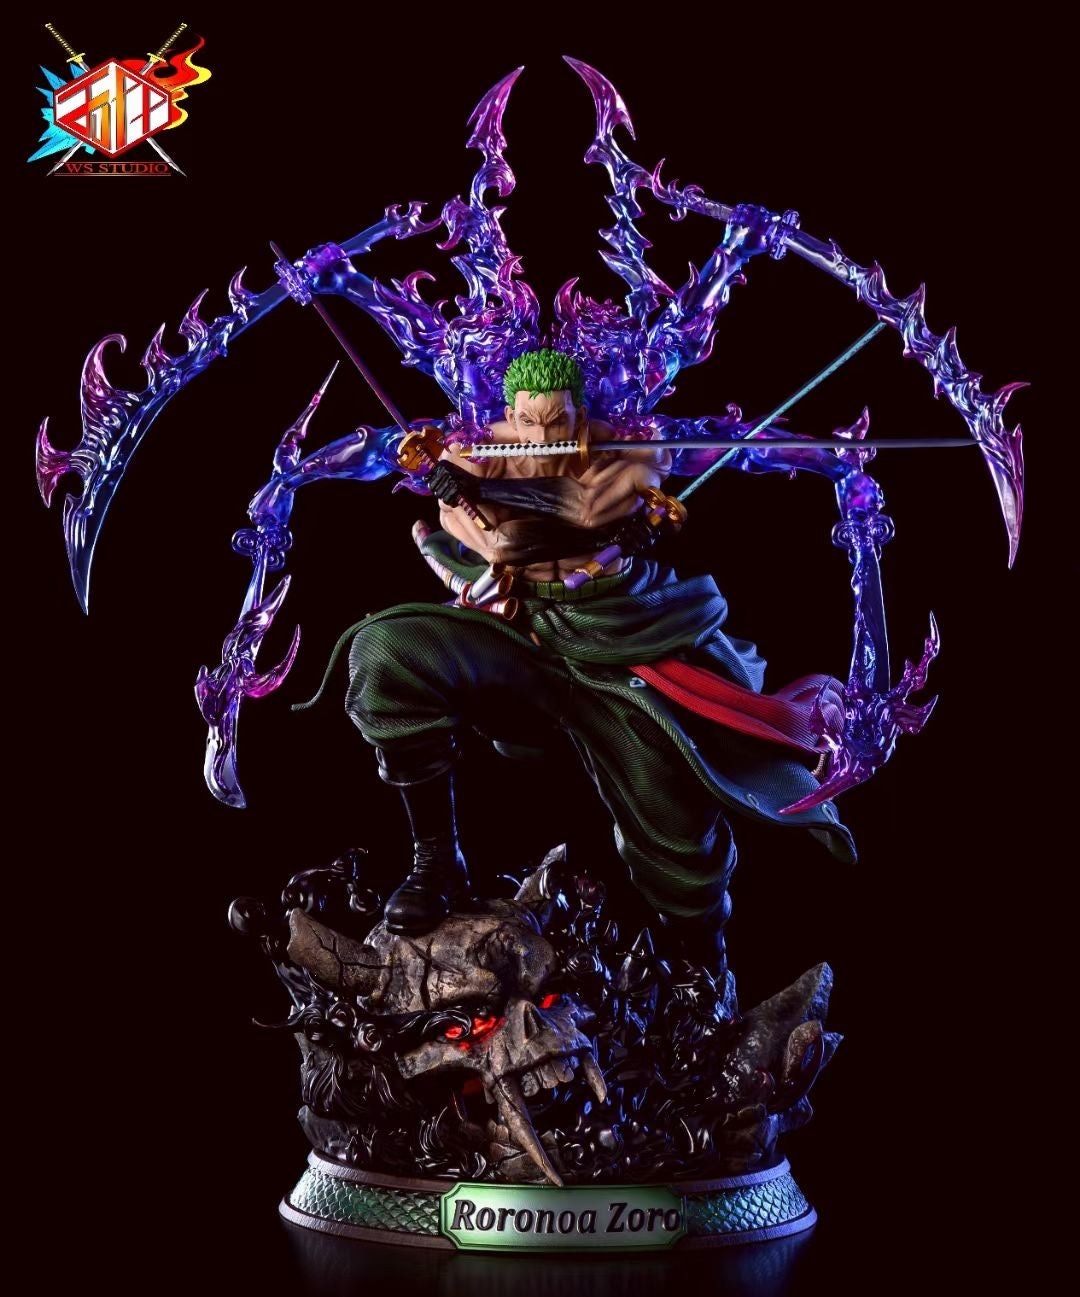 Image of [Pre-Order]One Piece WS Studio Zoro 1:6 Resin Statue